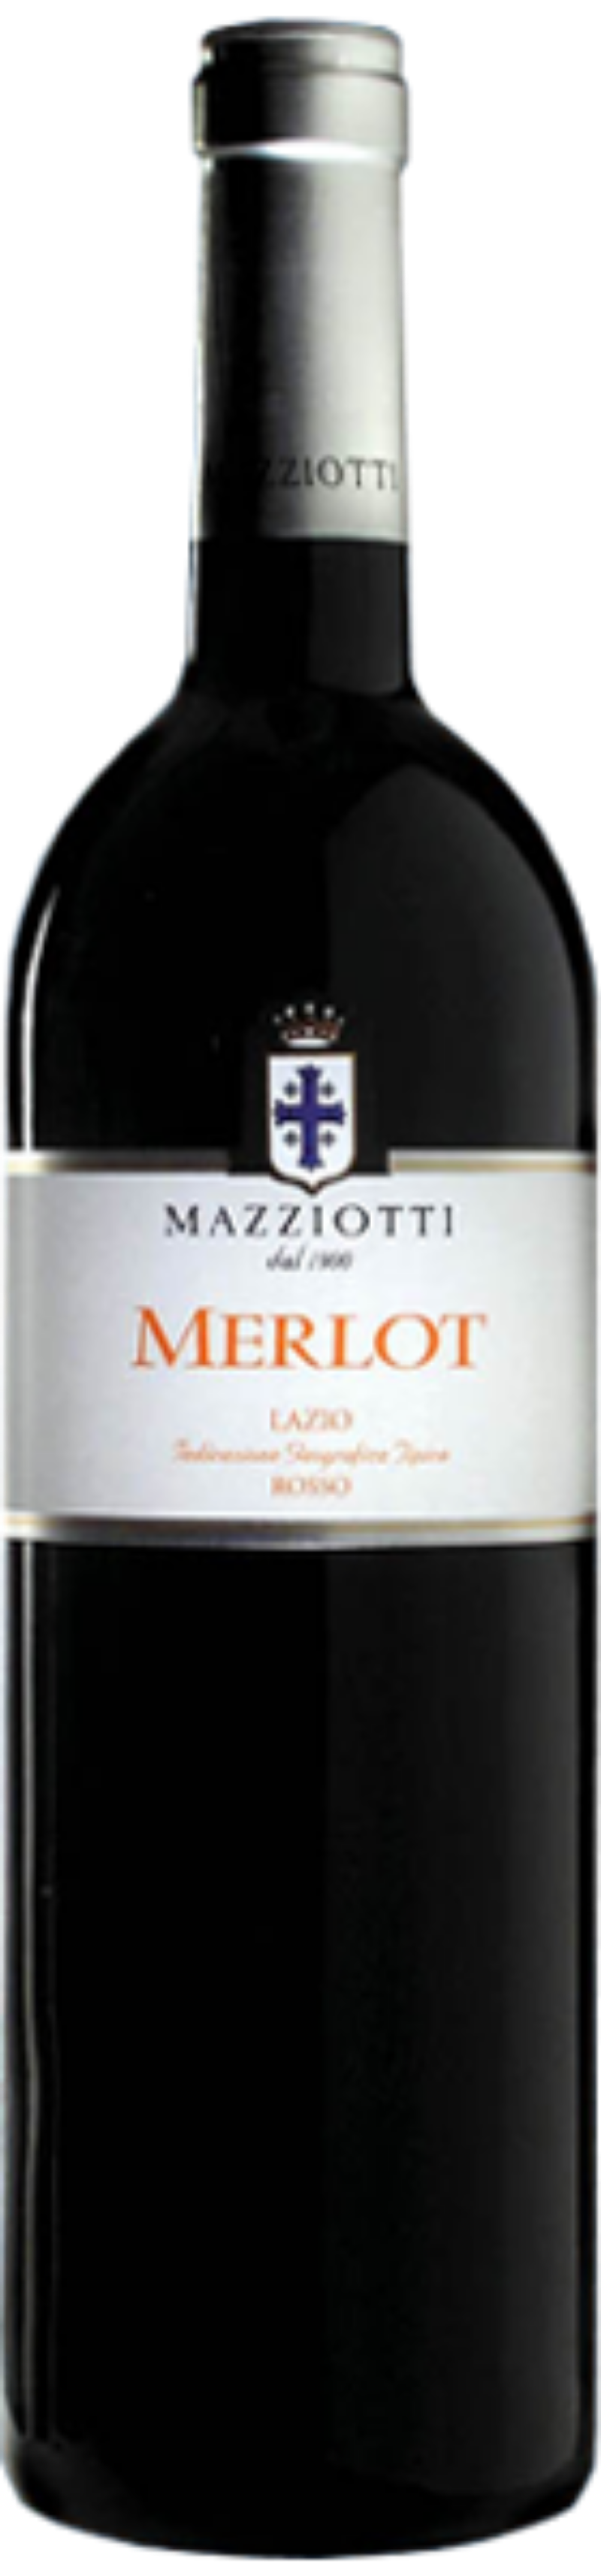 MERLOT----IGP--Lazio